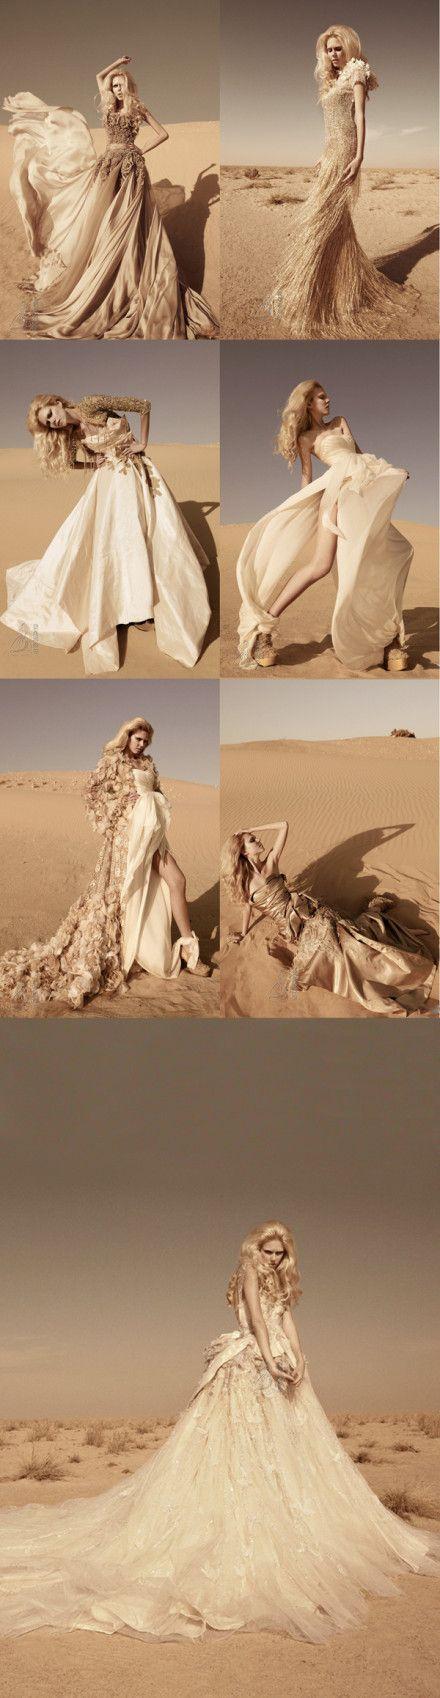 wedding desert pictures